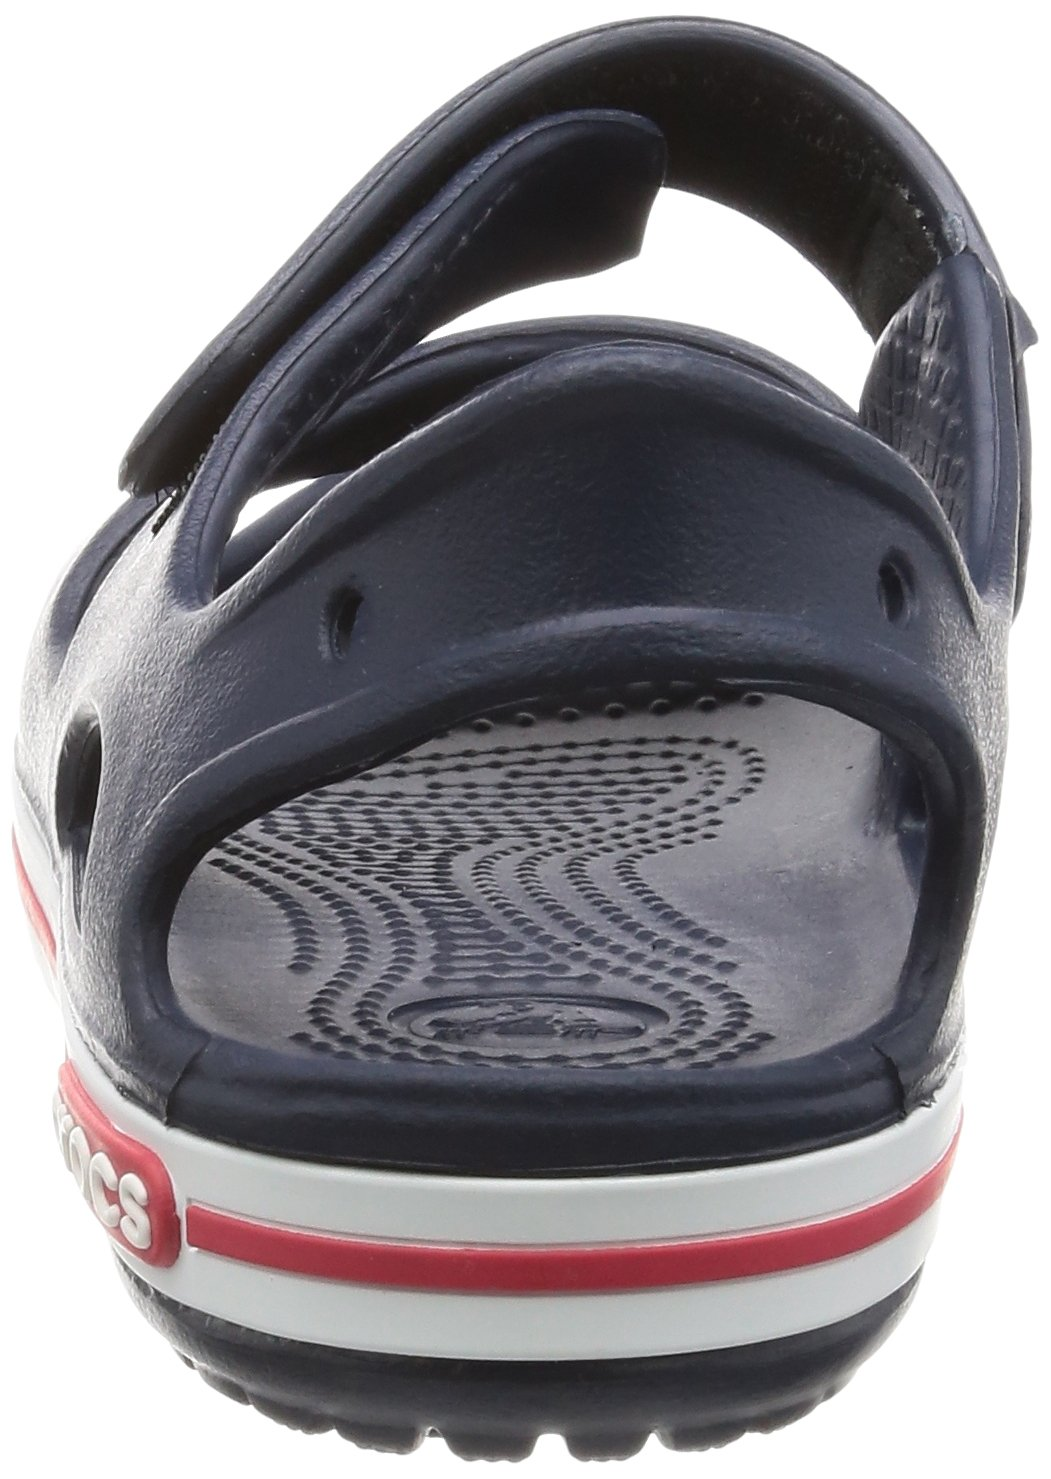 Crocs Kid's Boys and Girls Crocband II Sandal | Pre School, Navy/White, 5 M US Toddler by Crocs (Image #2)